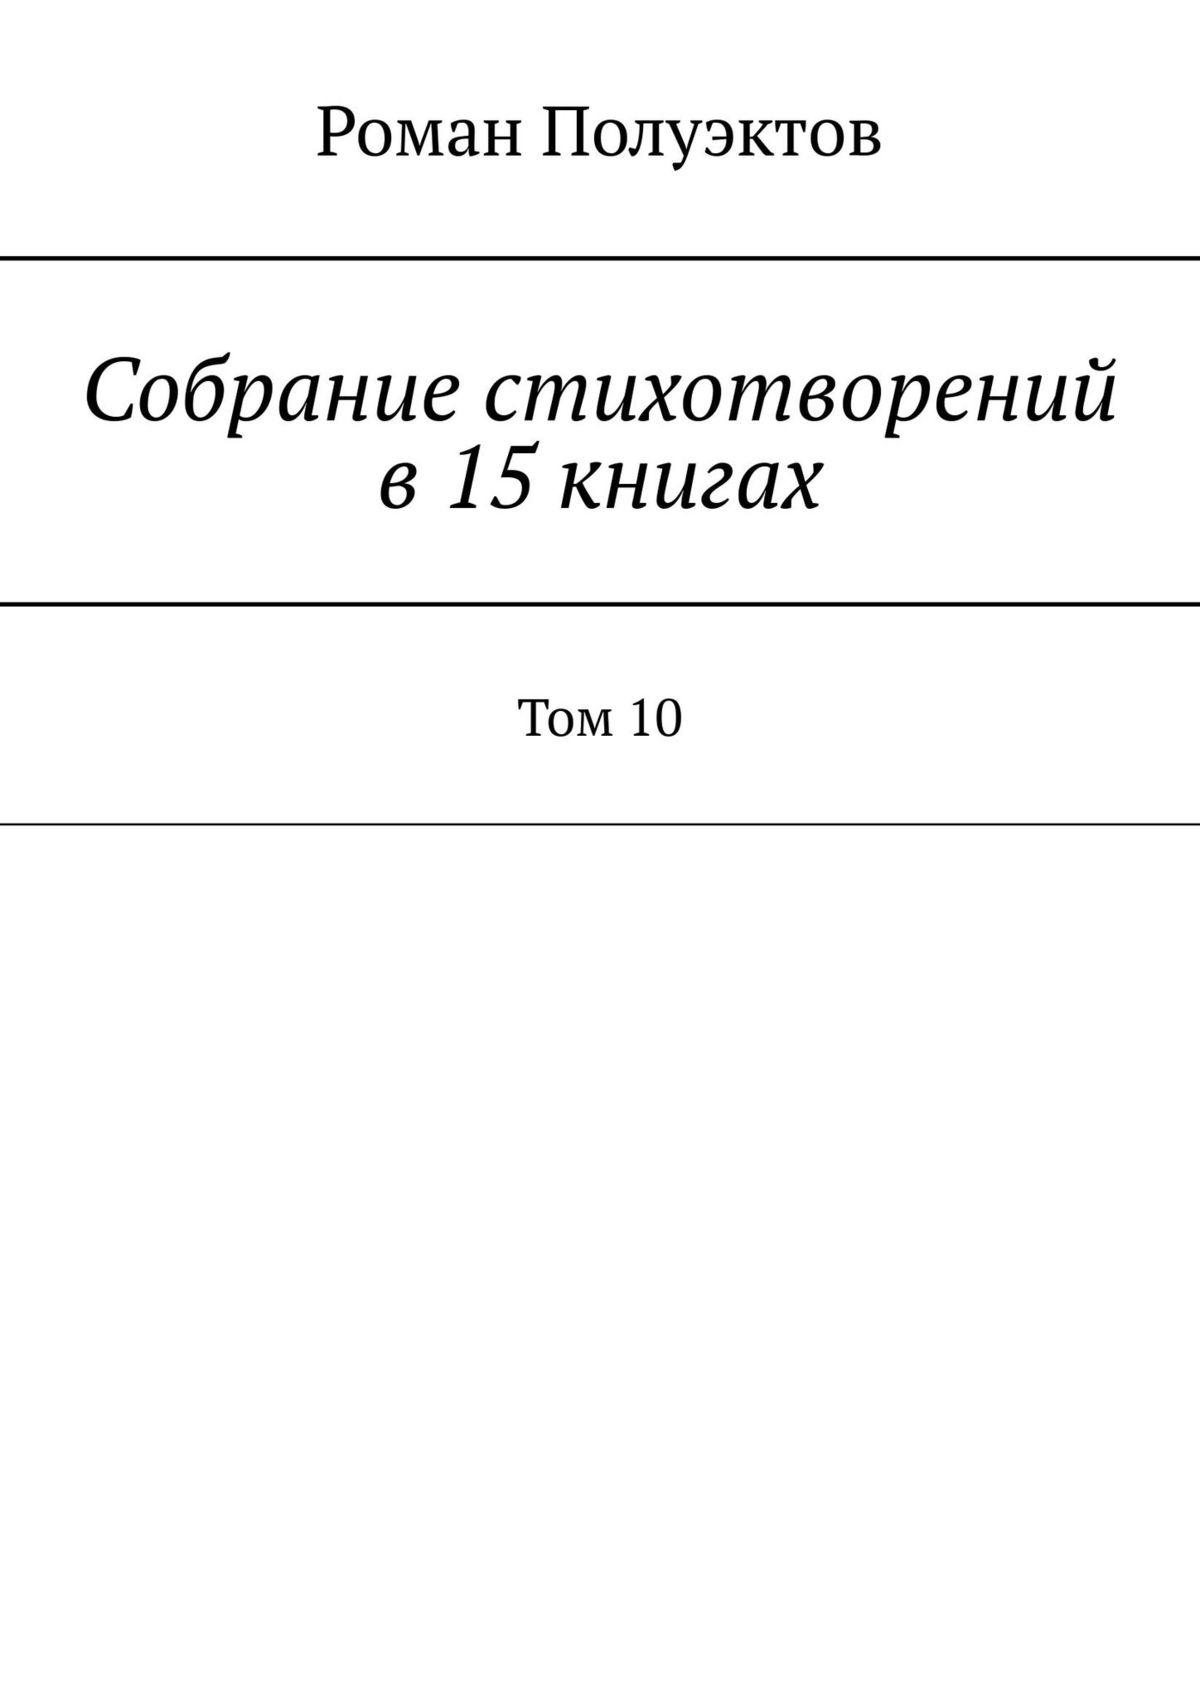 Роман Полуэктов Собраниестихотворений в15книгах. Том10 аппиано алессандра завтра все наладится роман